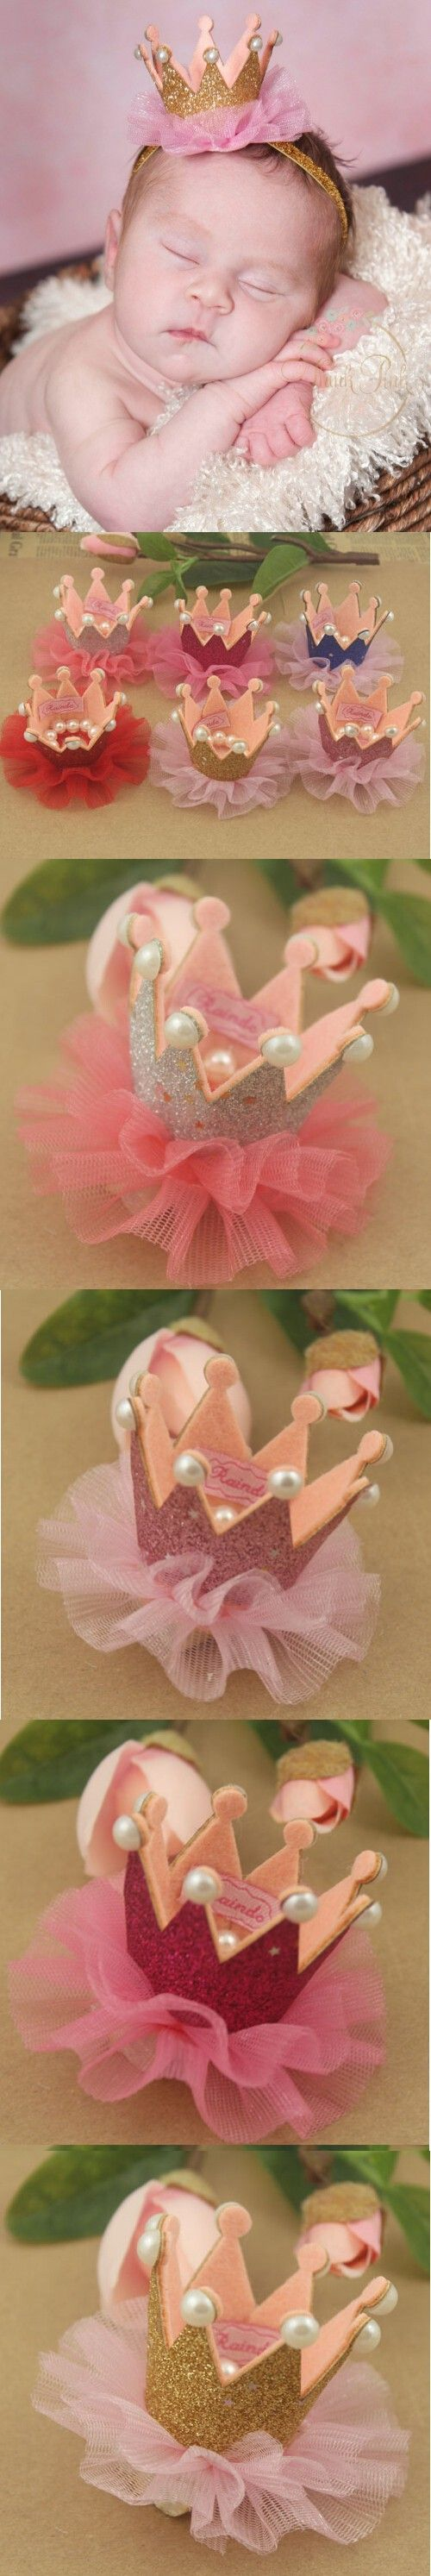 Newborn Crown,1st Birthday Crown For Baby headbands Newborn Baby Princess Crown Headbnad, Glitter Crown Headband. $33.9